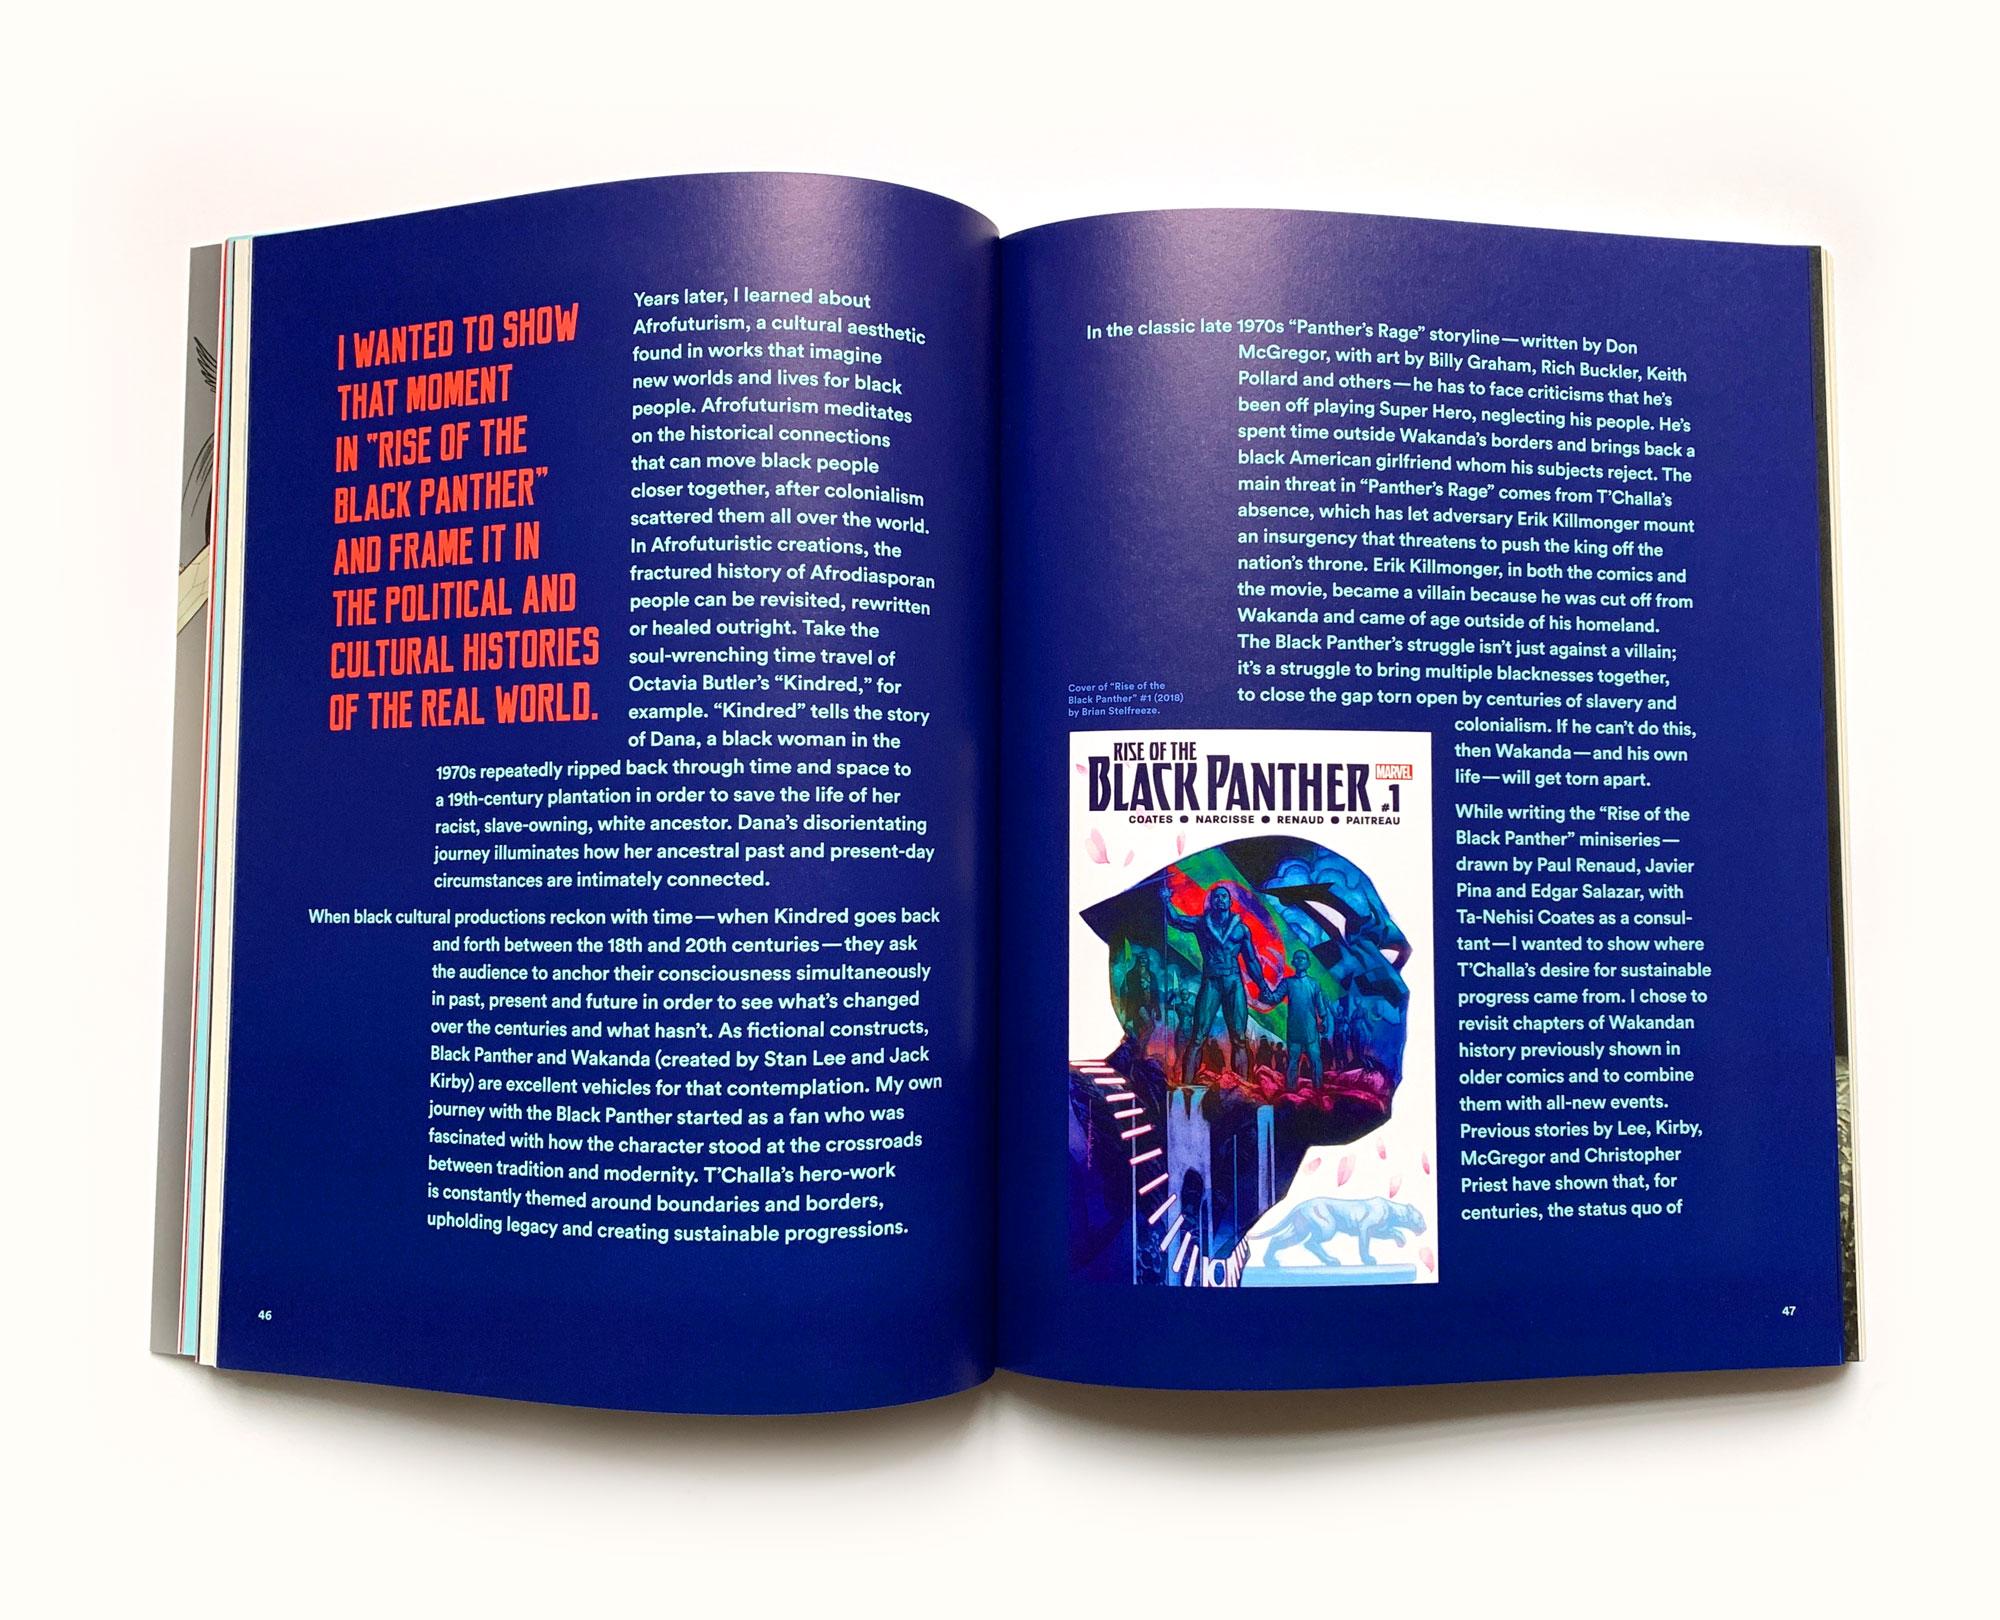 Marvel-Universe-of-Super-Heroes-Book-Balgavy-Avengers-BlackPanther3.jpg